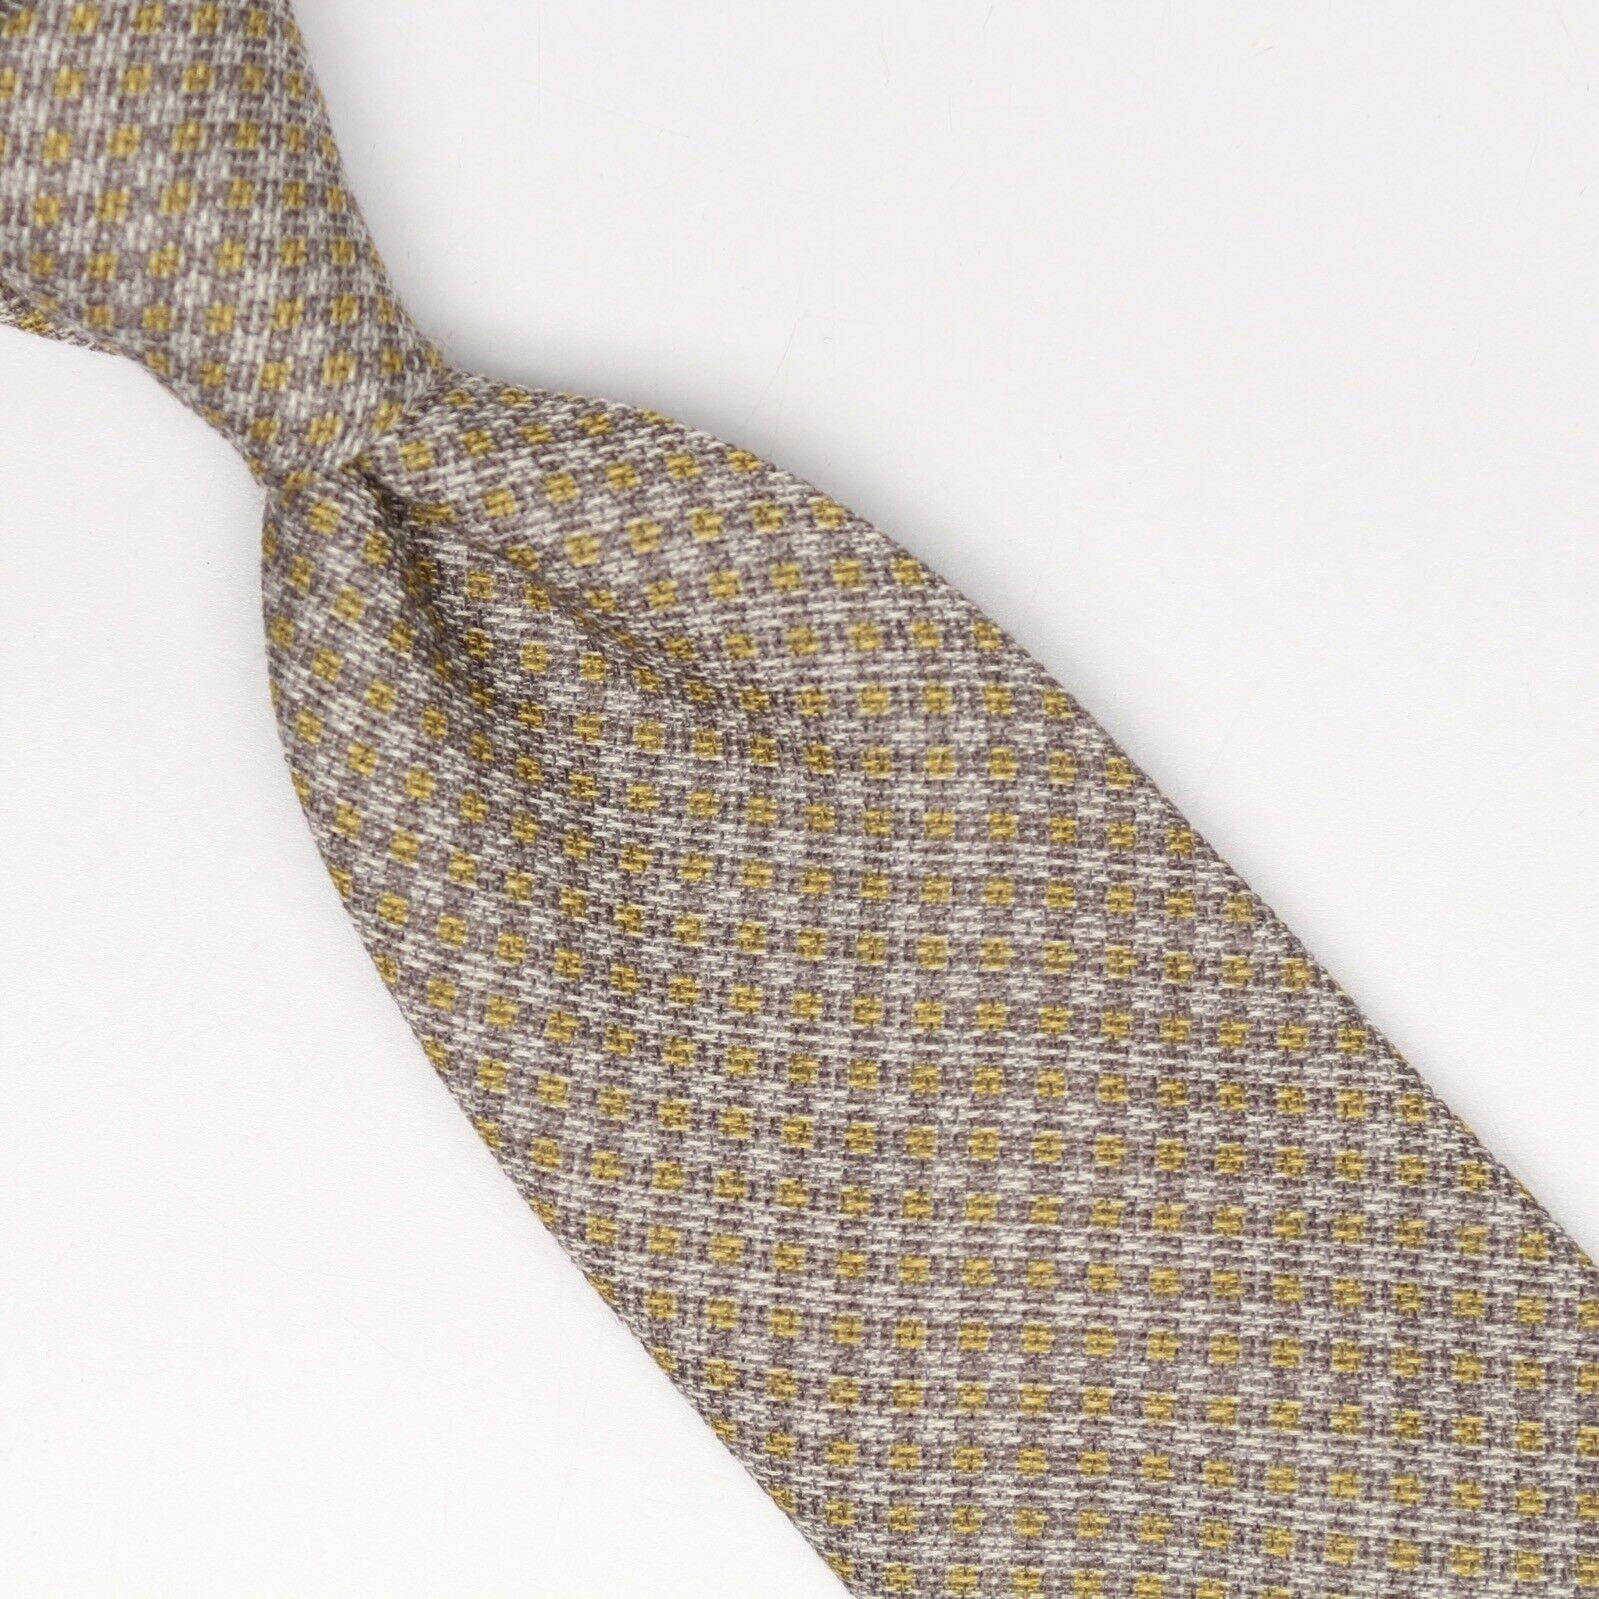 Josiah France Herren Wolle Seide Krawatte Grau Gold Kariert Aufdruck Lose Gewebe